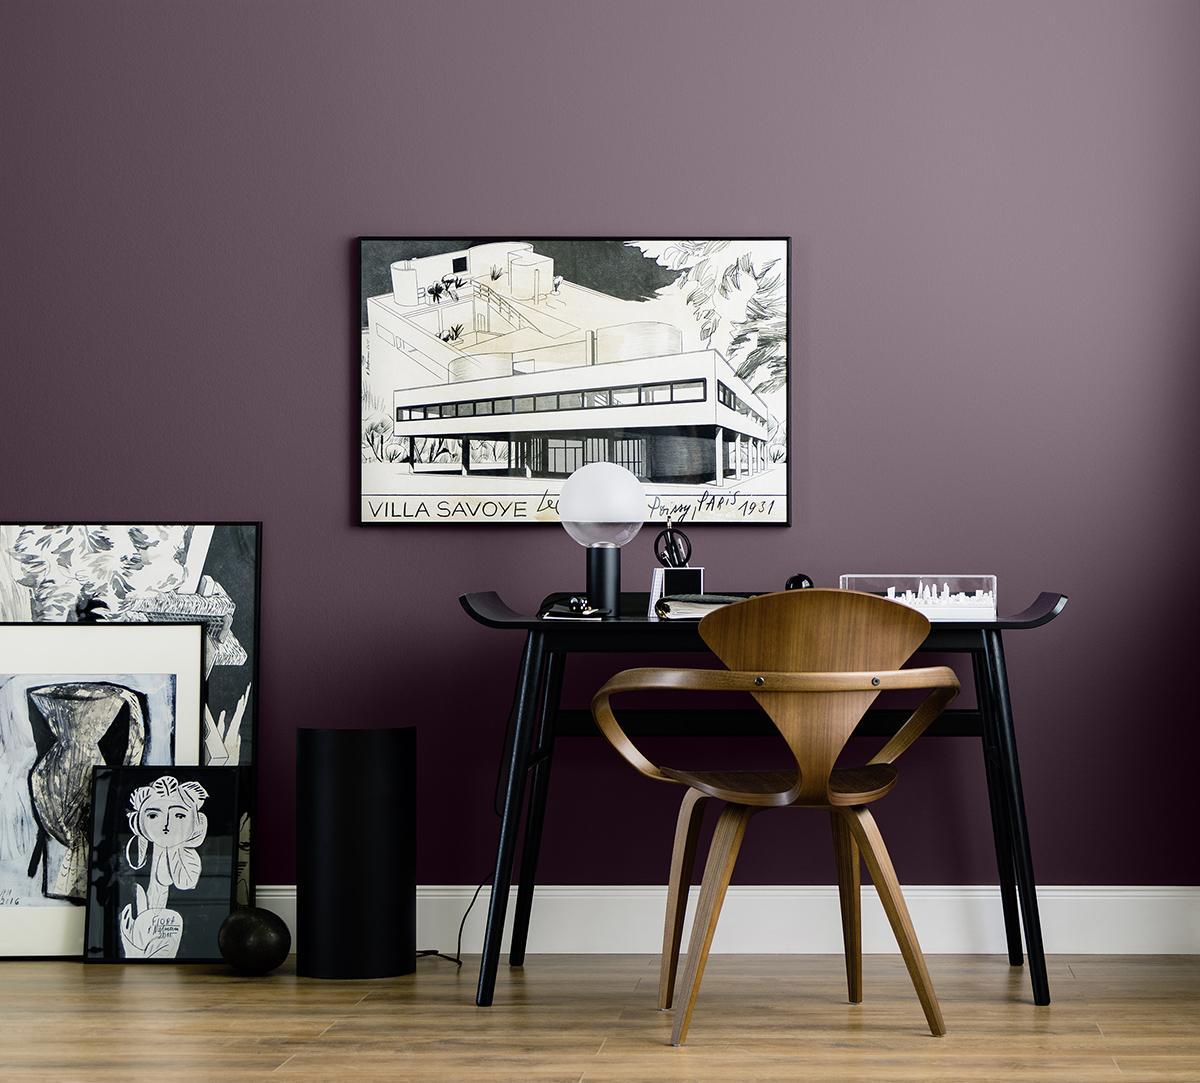 Arbeitszimmer Wandfarbe lila wandfarbe bilder ideen couchstyle